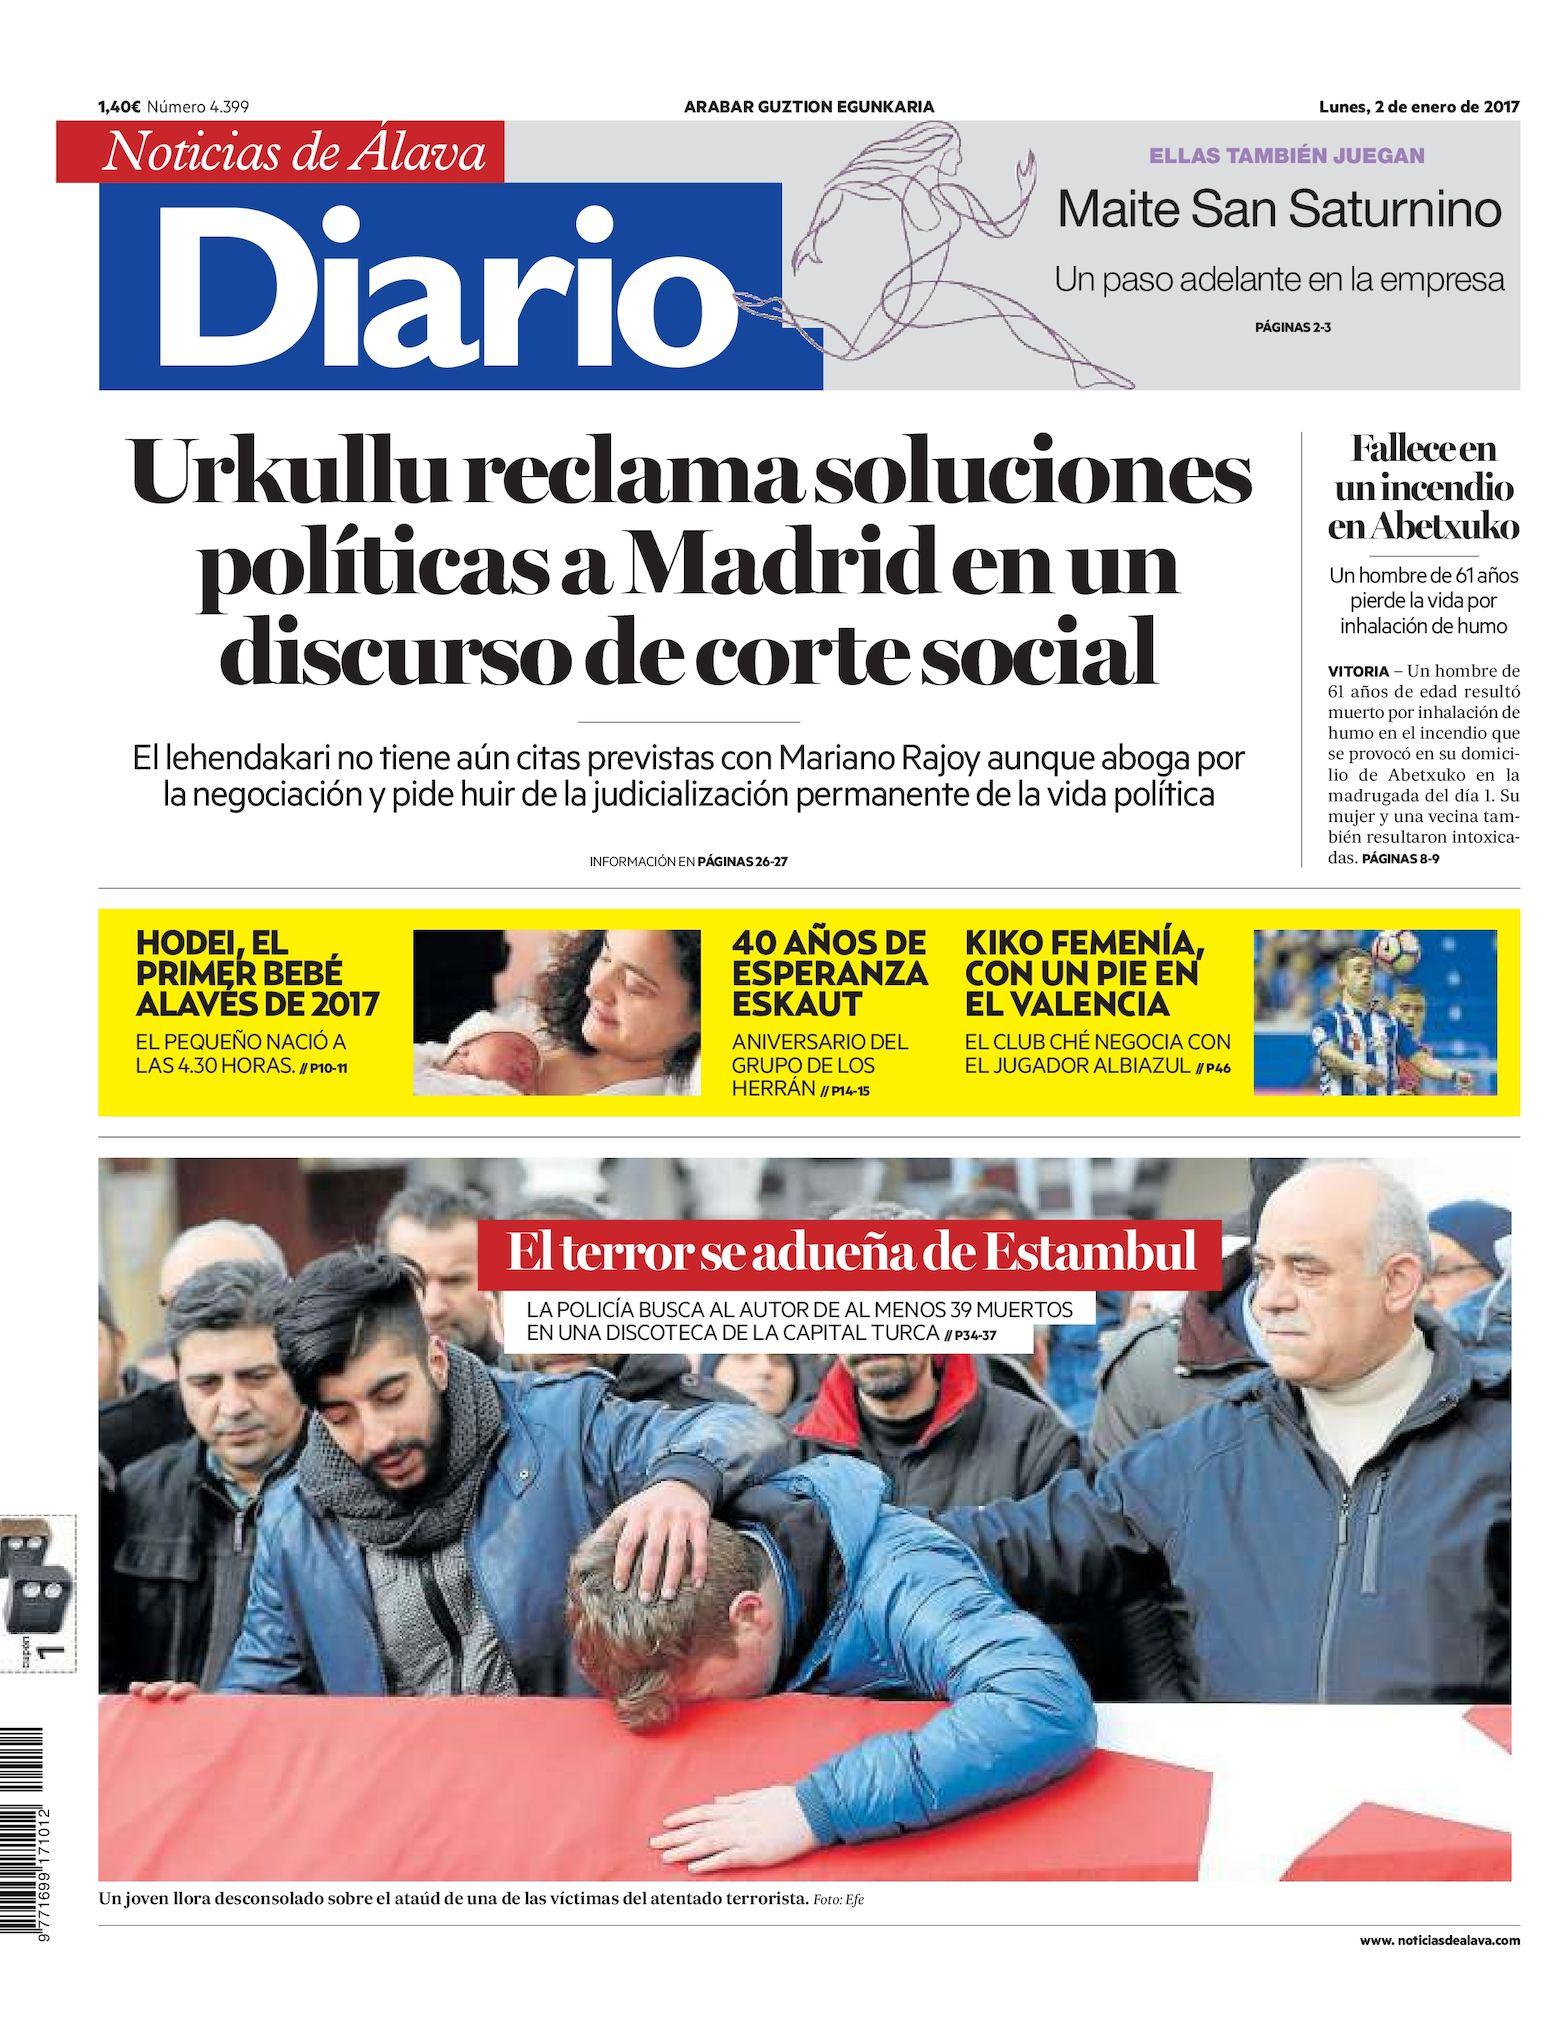 6c11ecca6f Calaméo - Diario de Noticias de Álava 20170102